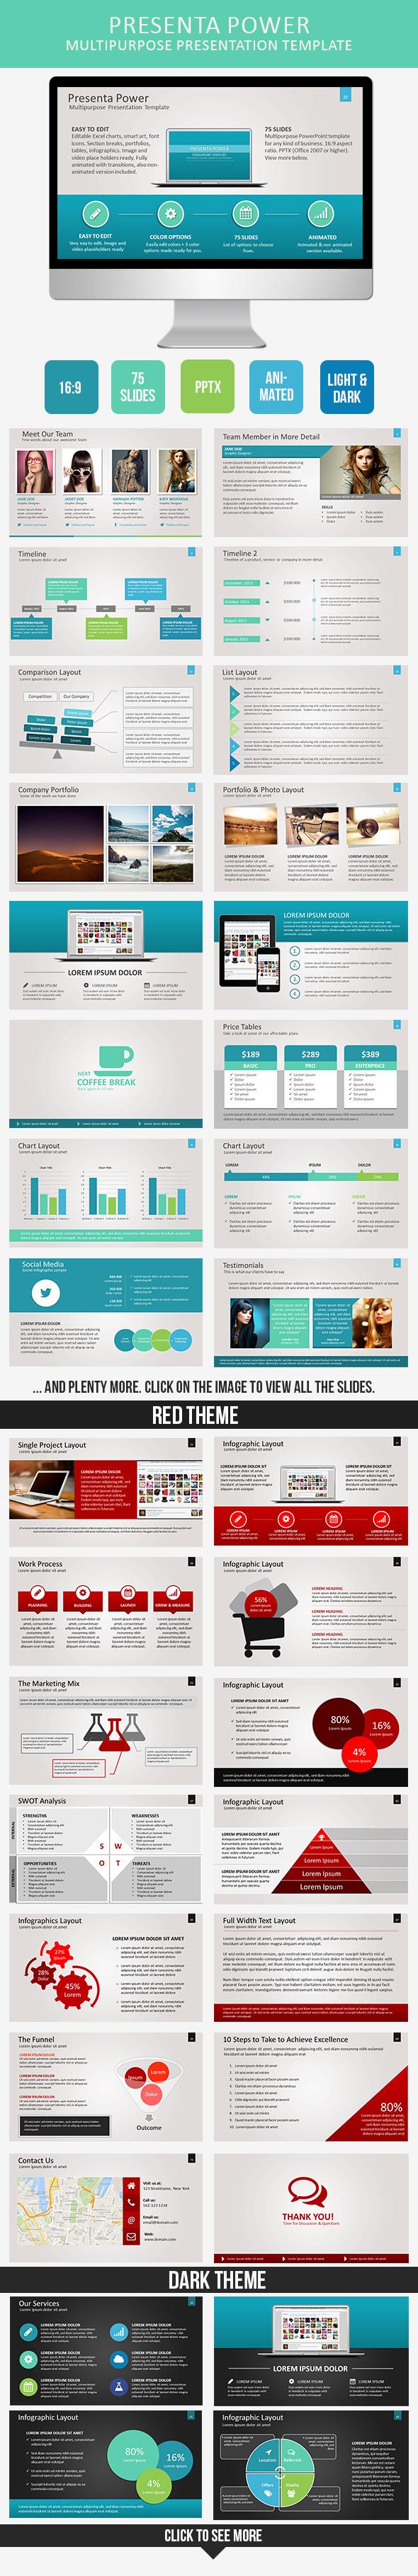 Presenta Power PowerPoint Template